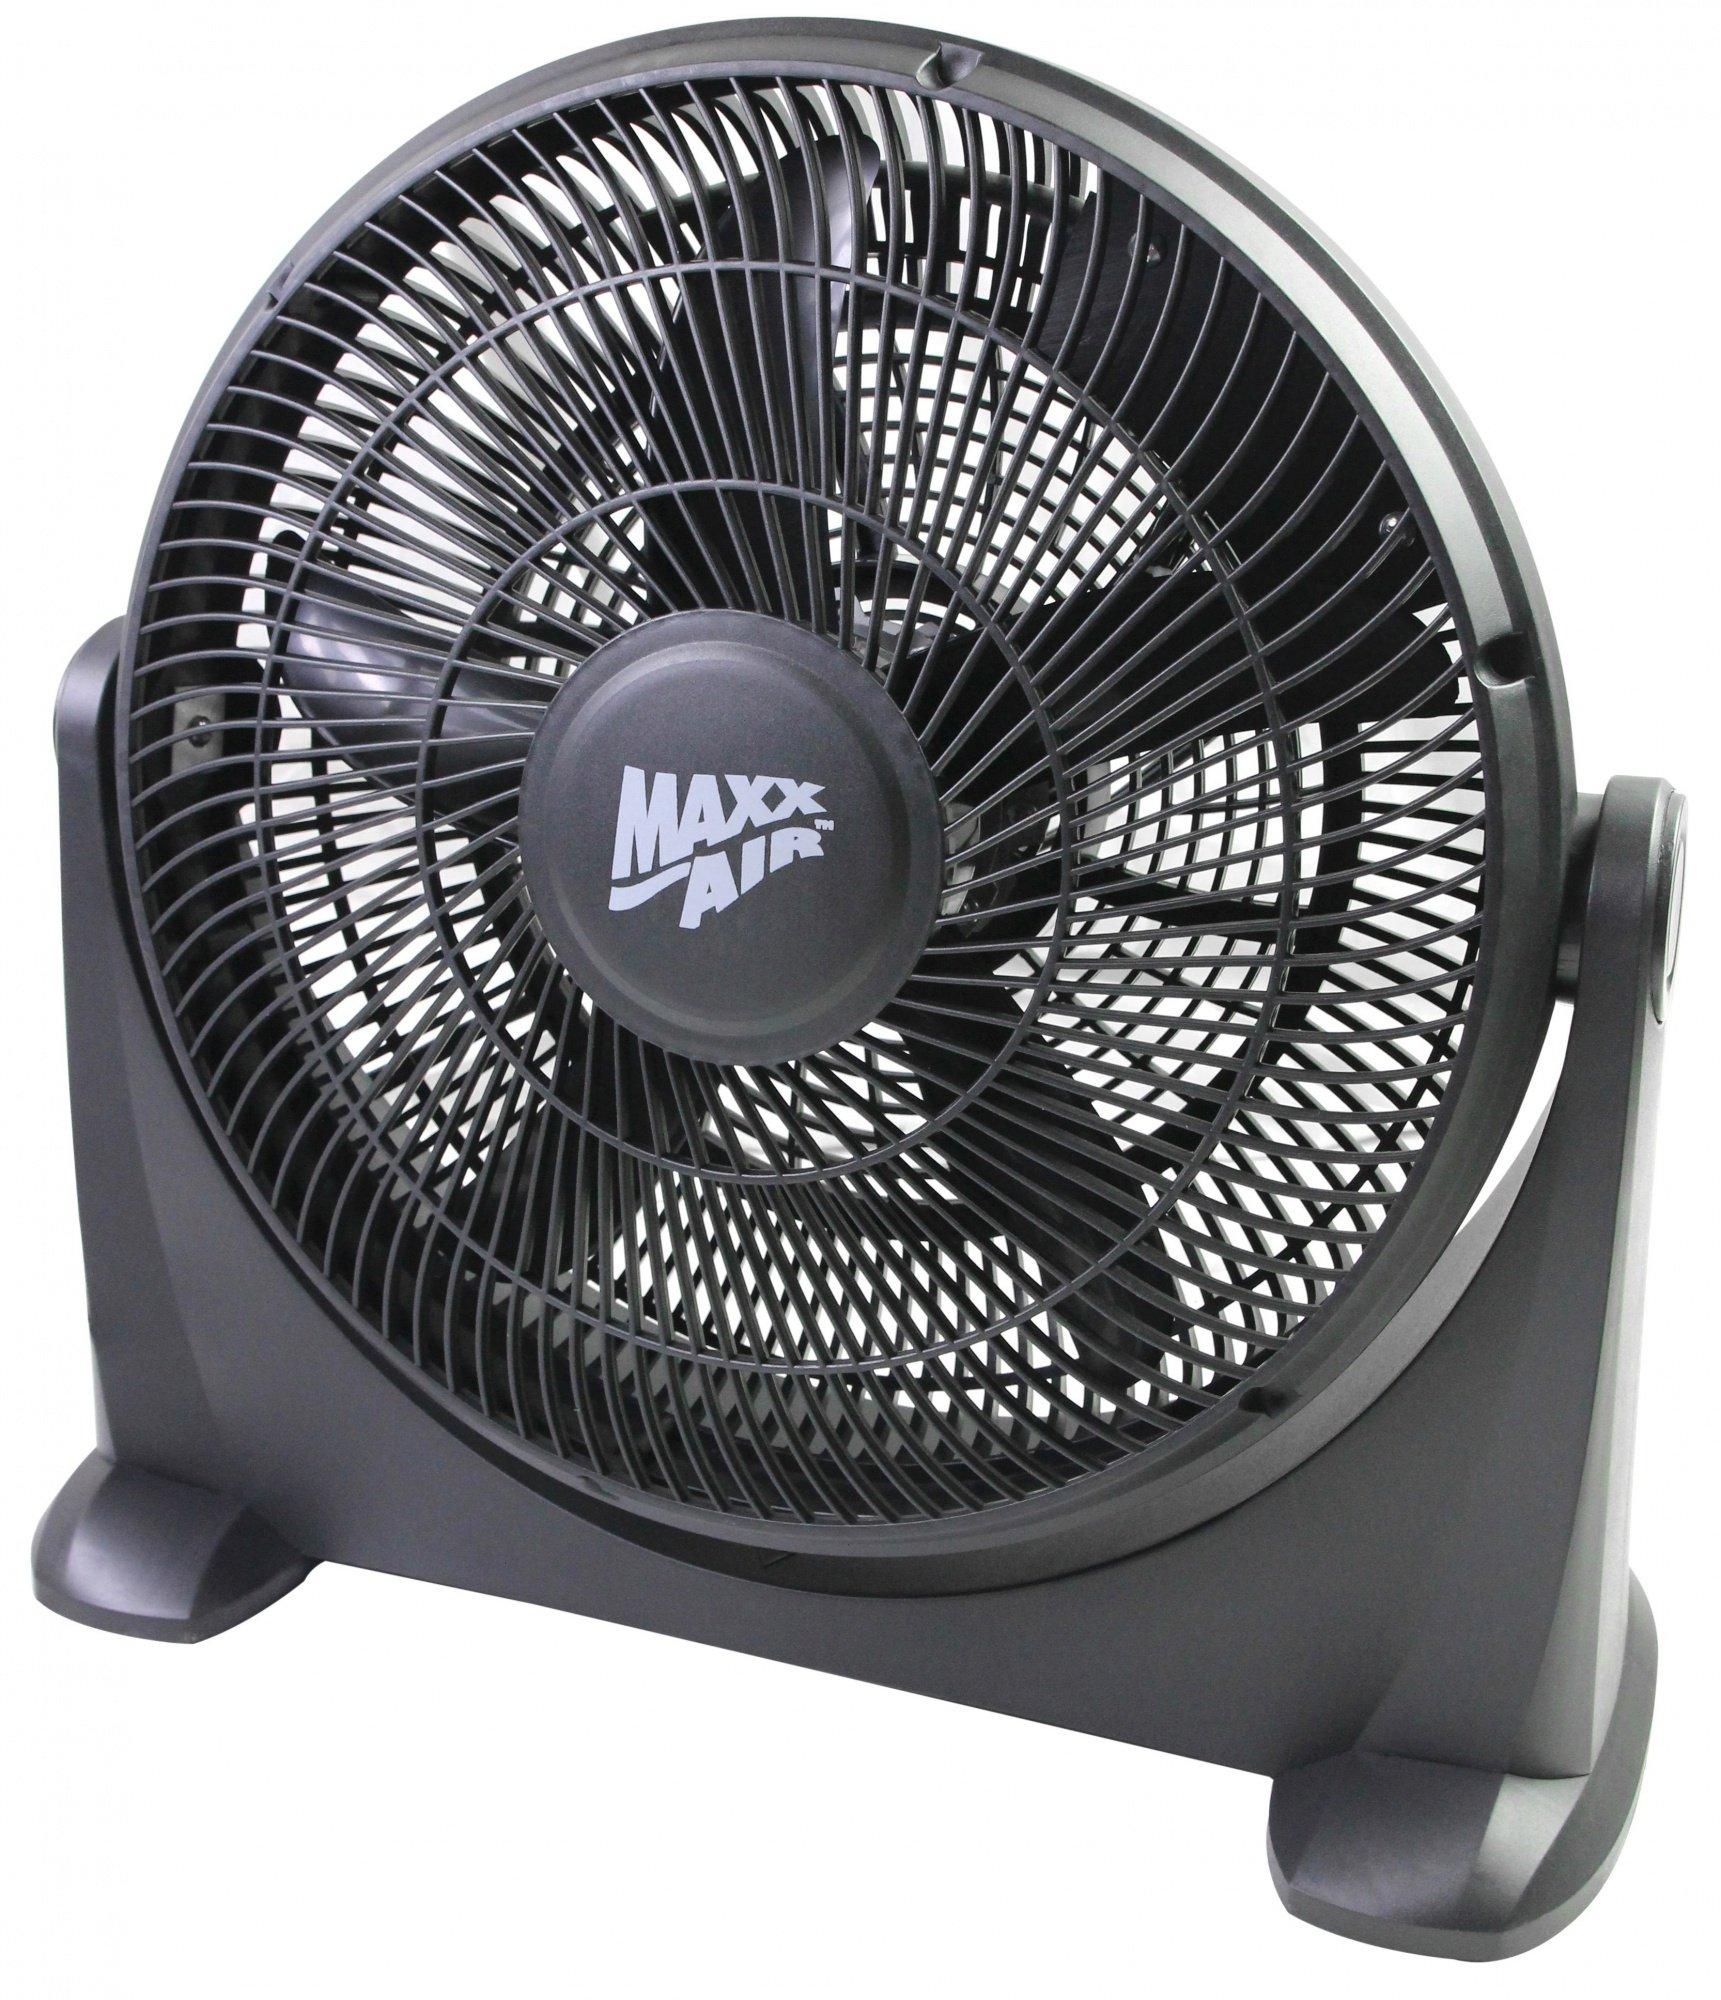 Maxxair HVFF 14P 14 Inch High Velocity Floor Fan, 120V